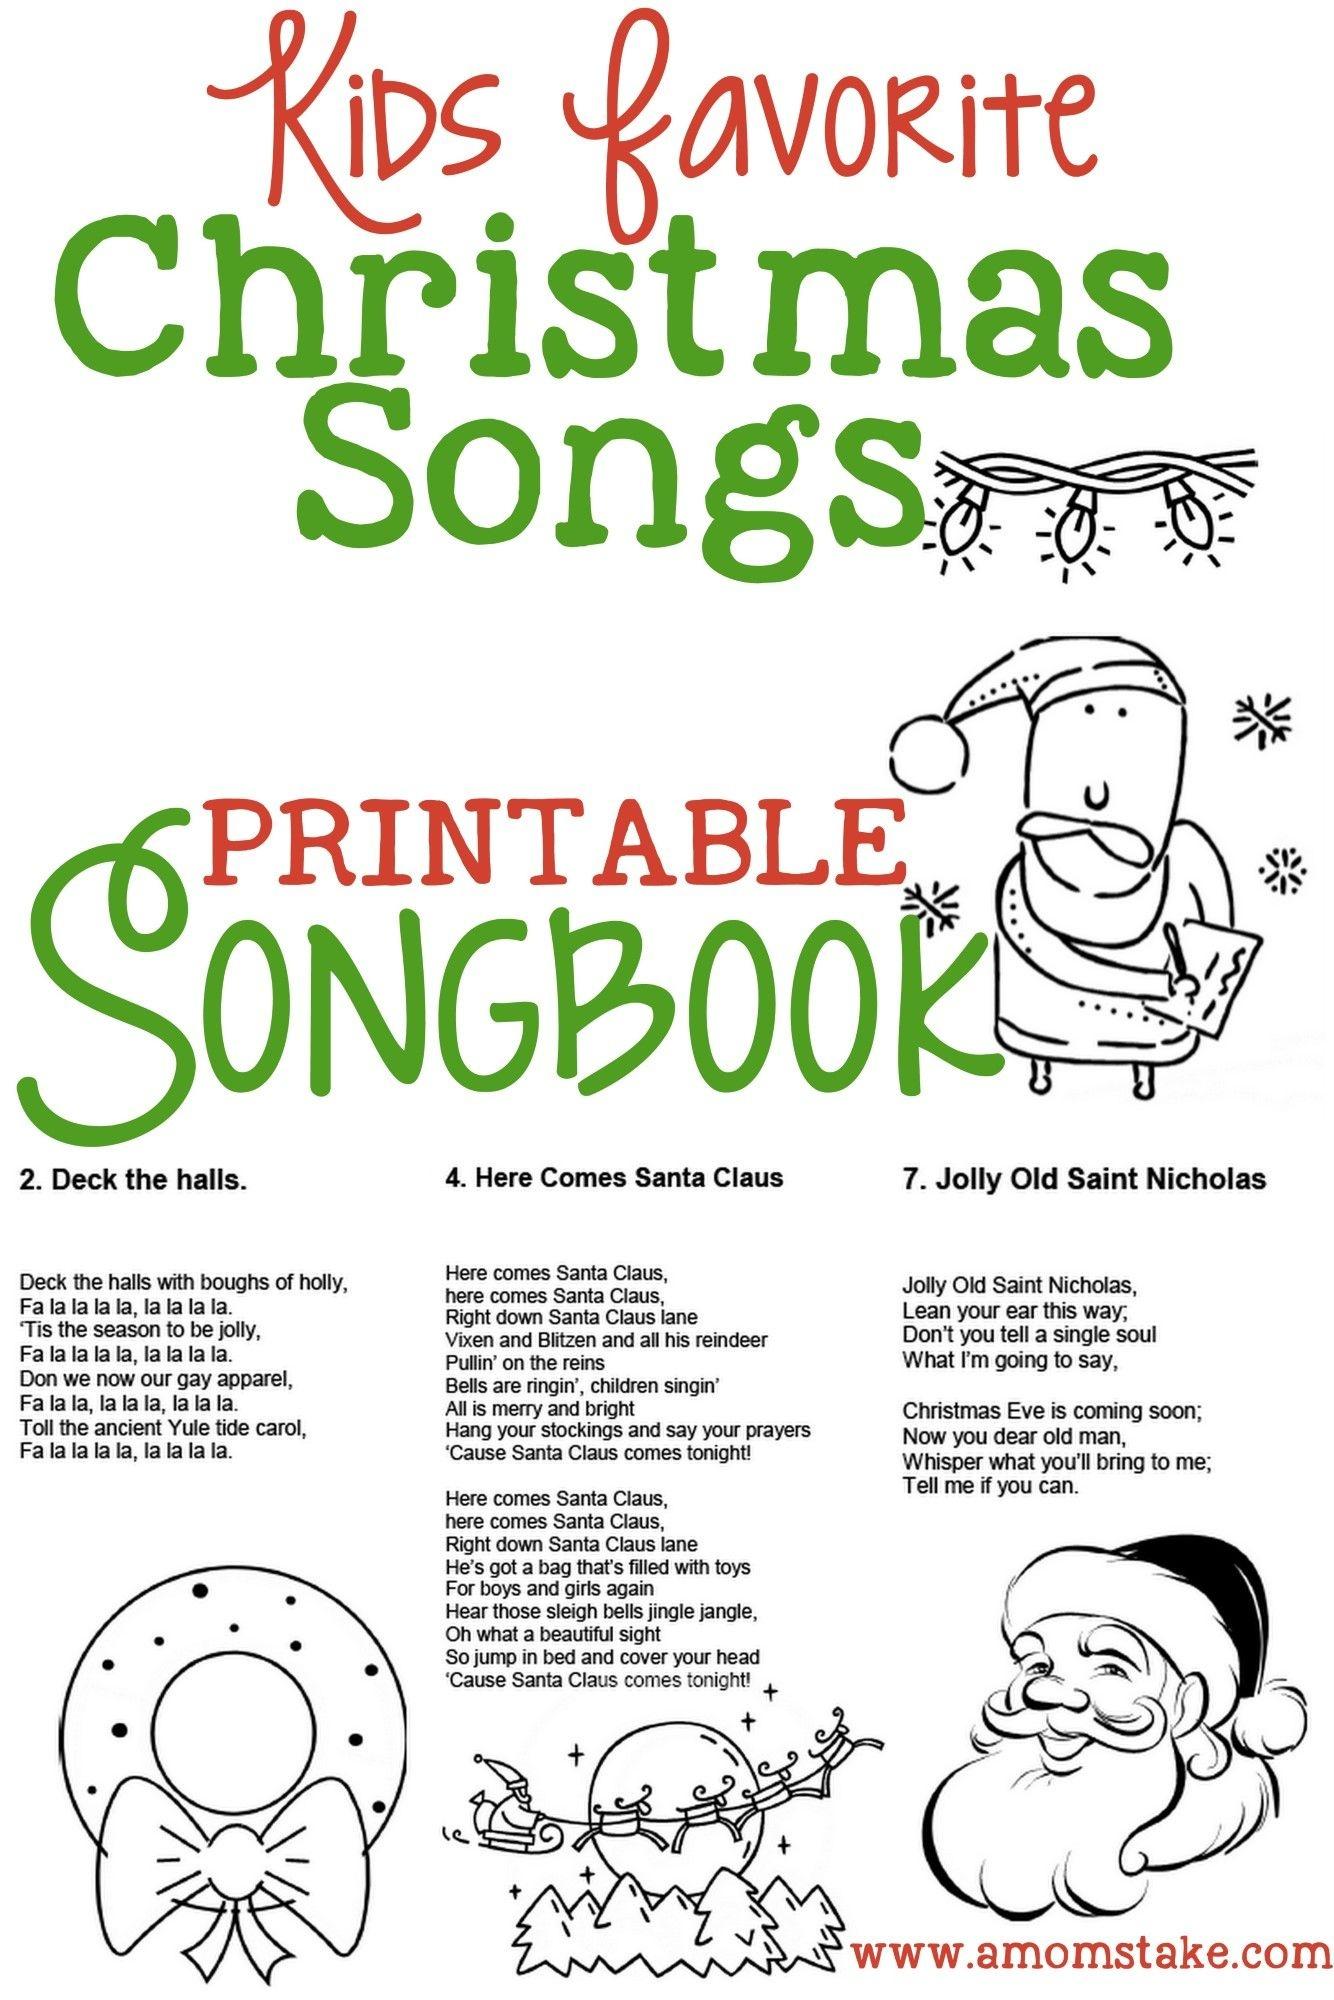 Christmas Songs For Kids – Free Printable Songbook! A Coloring Book - Free Printable Lyrics To Christmas Carols